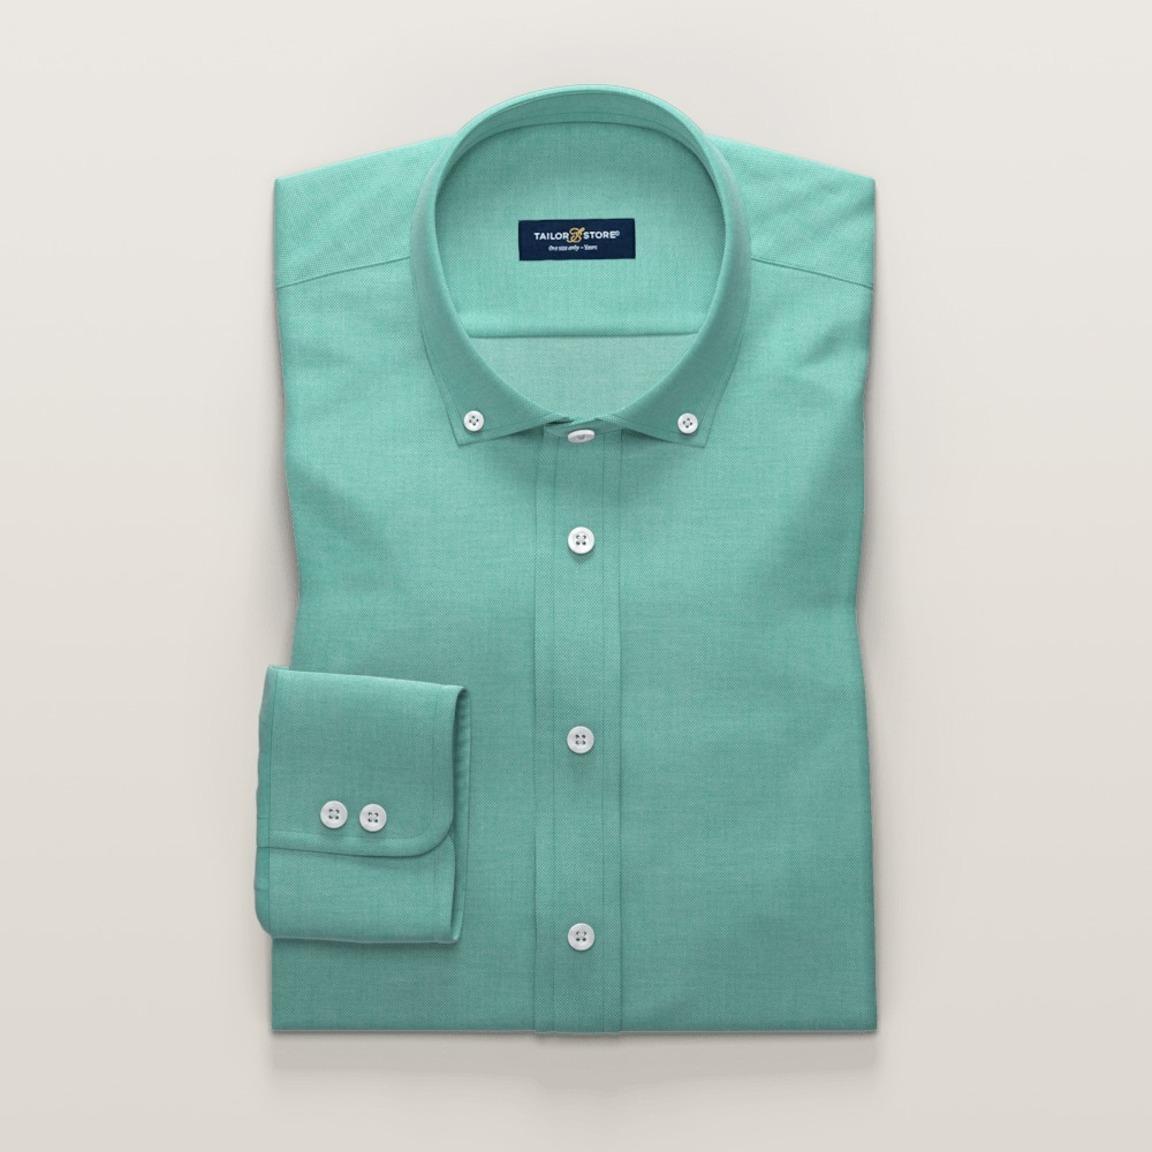 Dames business overhemd in groen licht dobbyweefsel